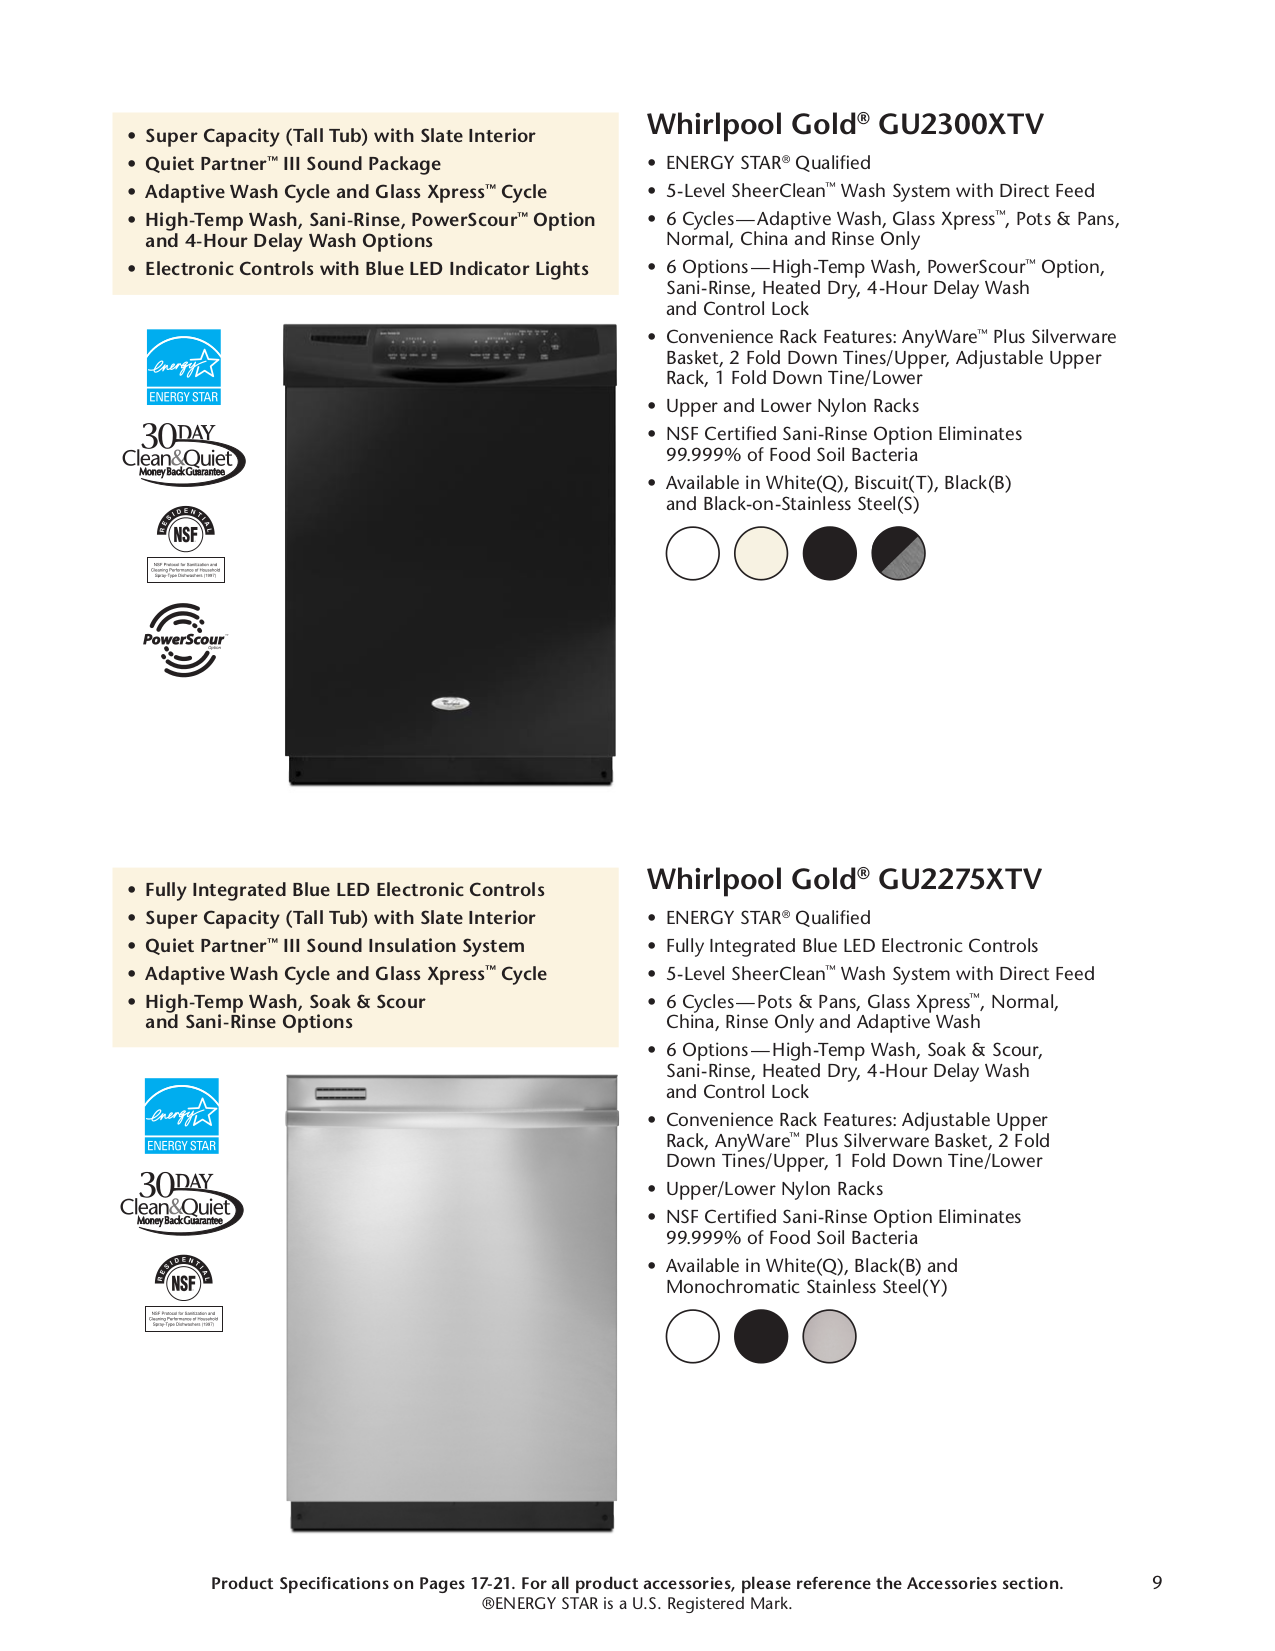 download free pdf for whirlpool gold gu2300xtv dishwasher manual rh umlib com